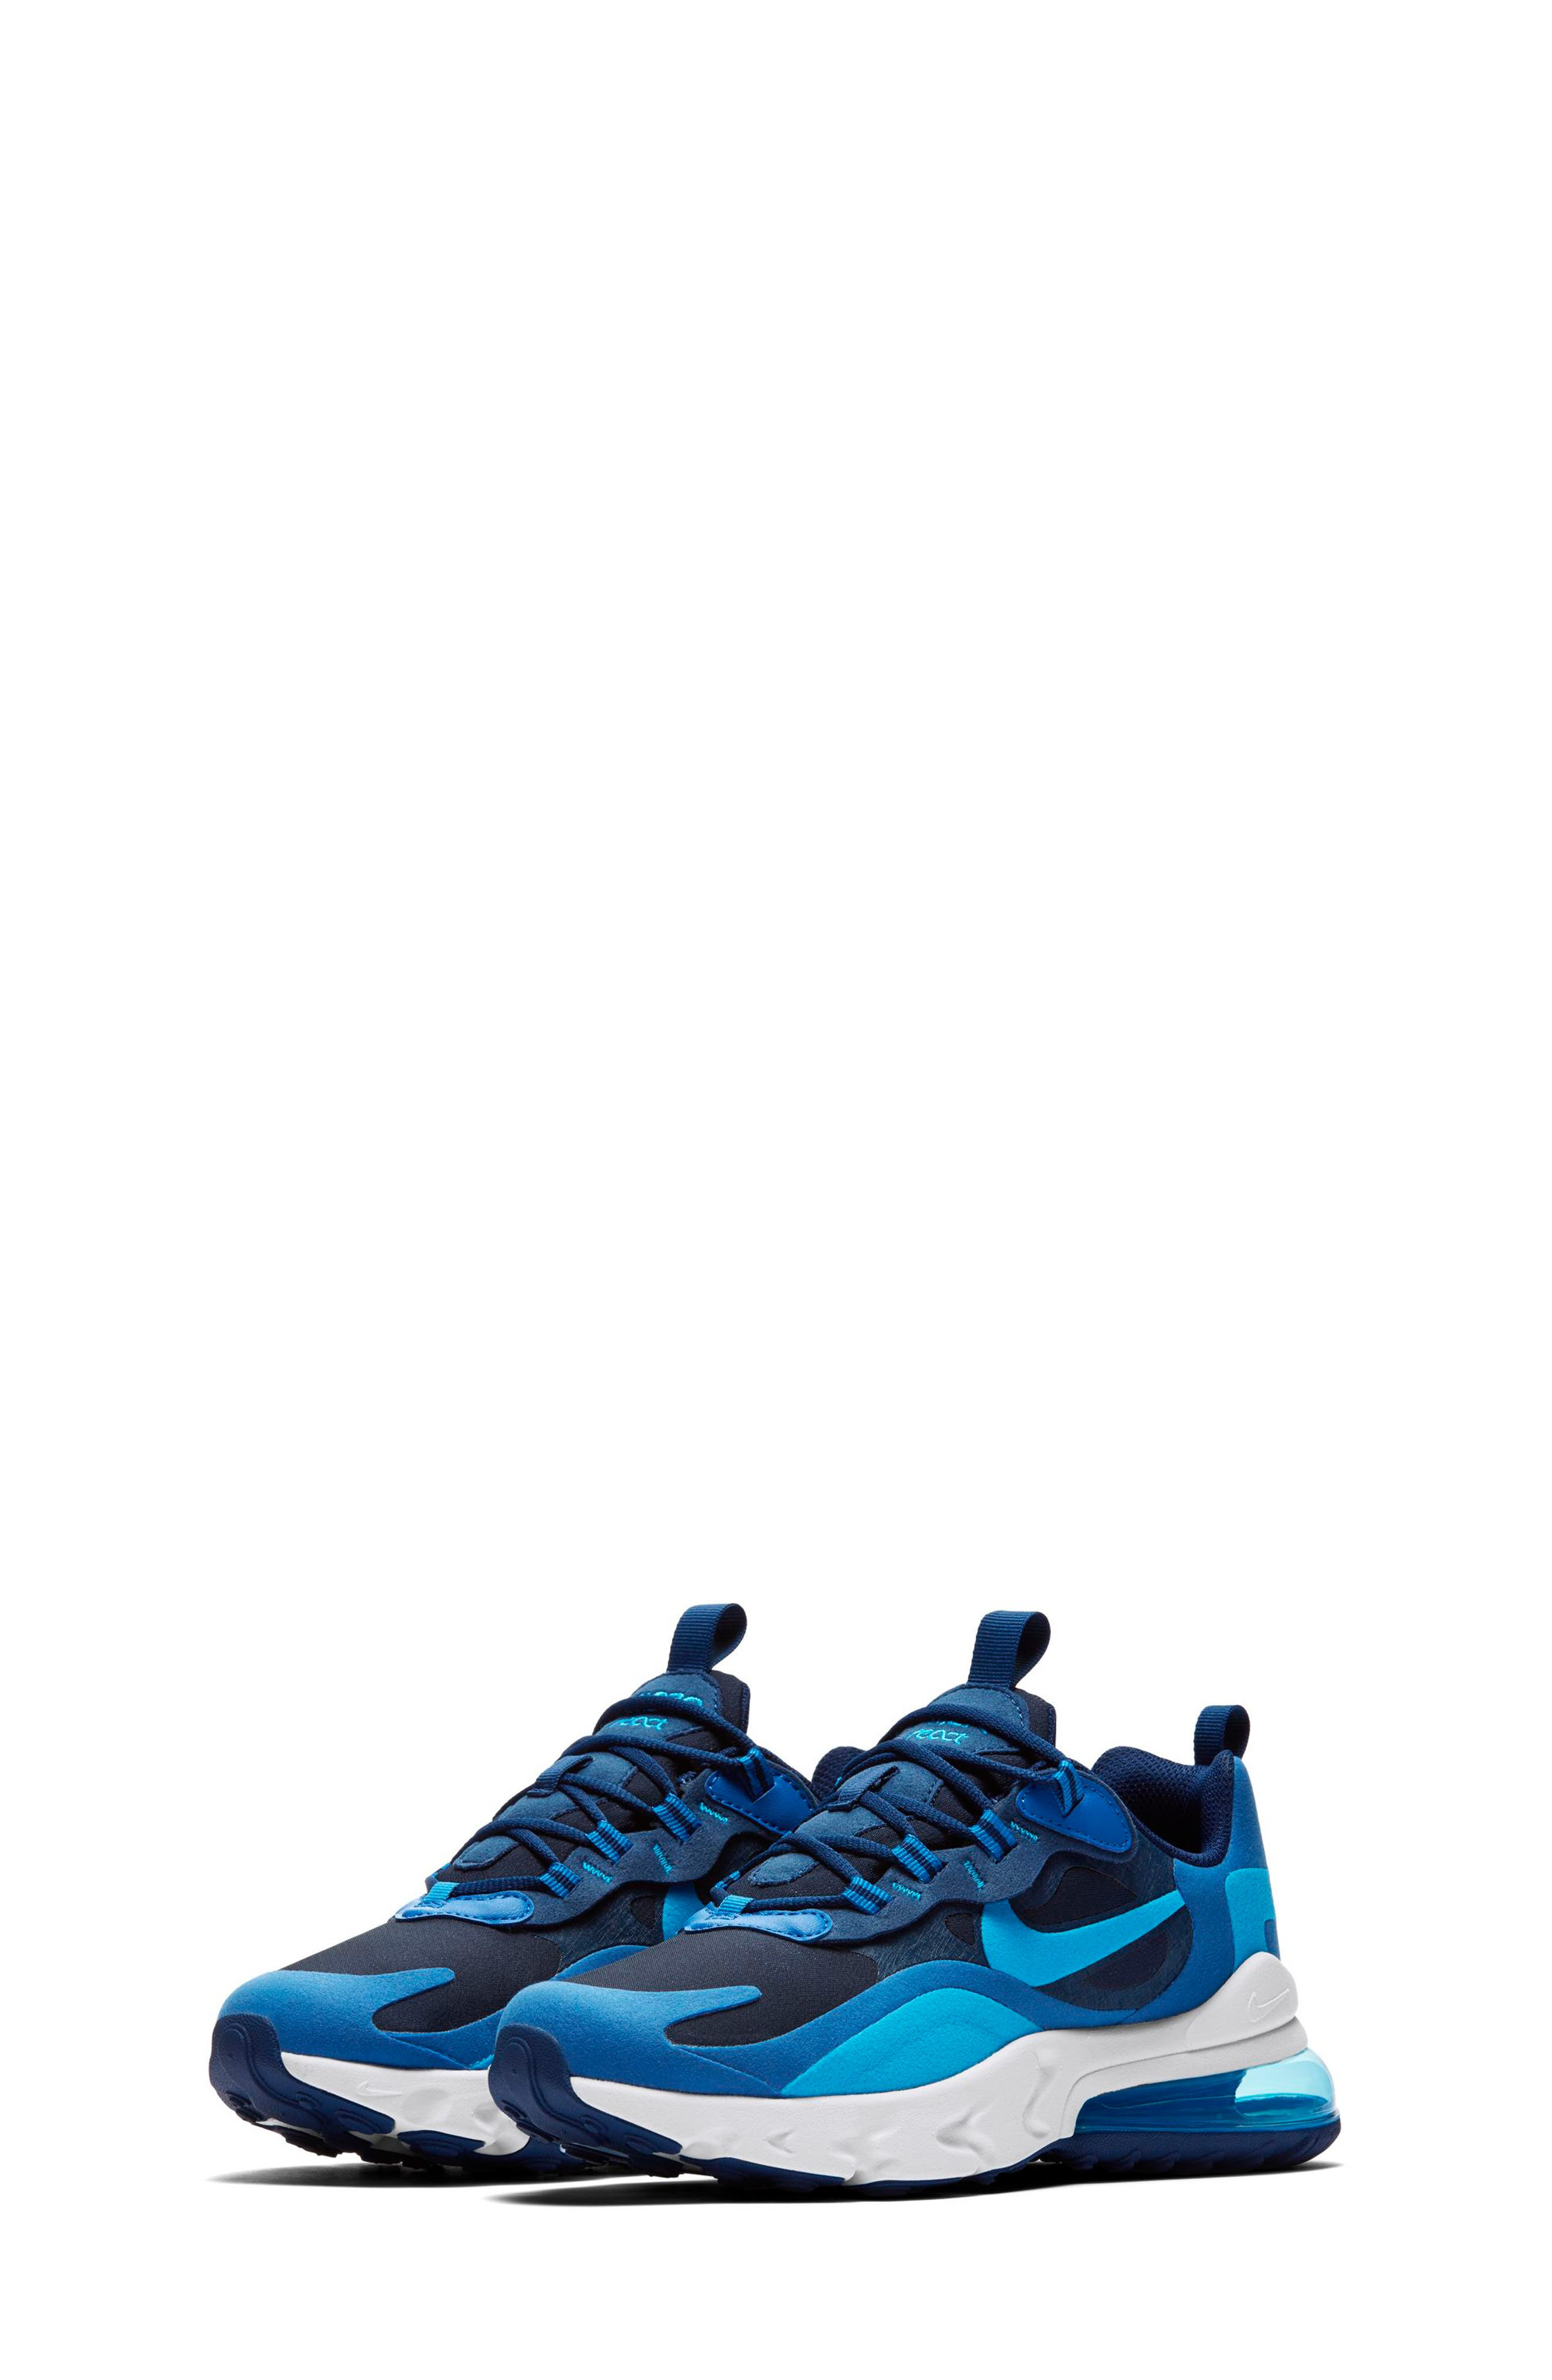 Big Girls' Blue Shoes (Sizes 3.5 7)   Nordstrom